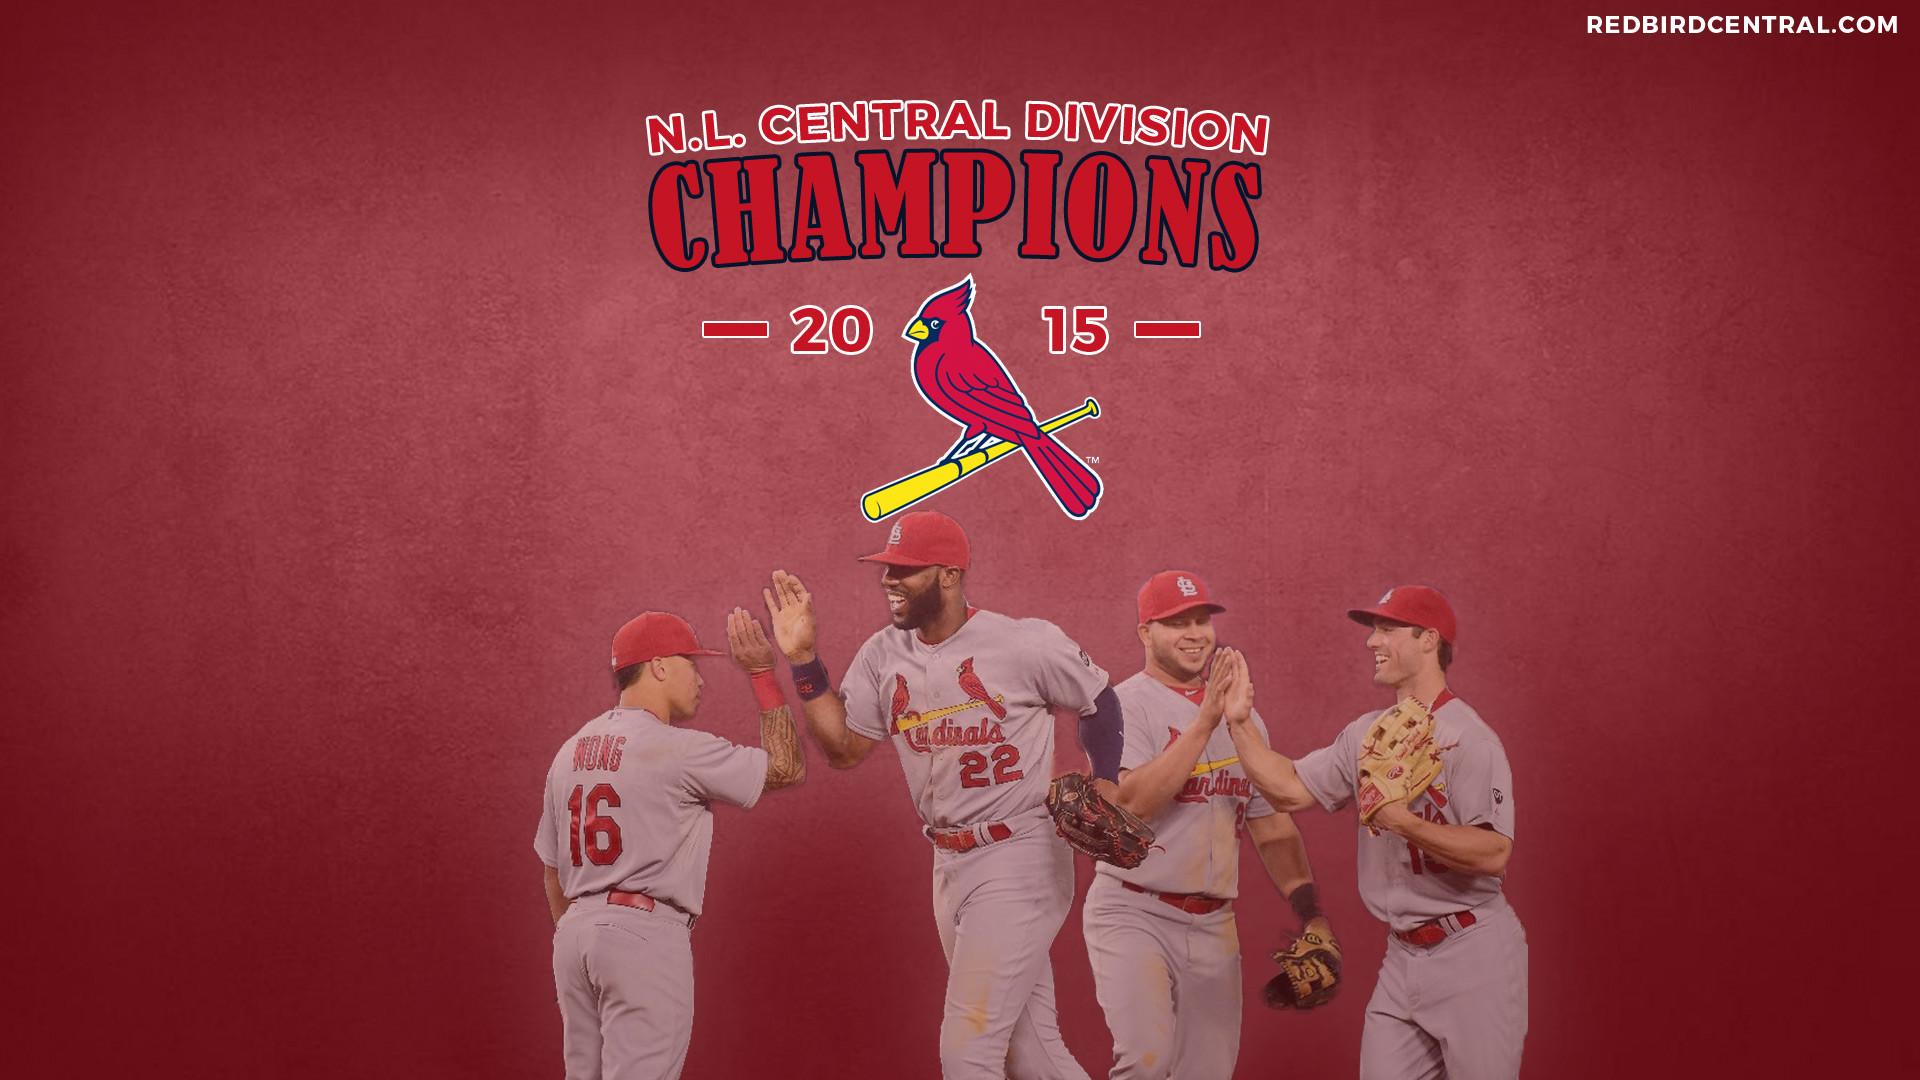 RedbirdCentral.com – St. Louis Cardinals Wallpaper – 2015 Central Division  Champions